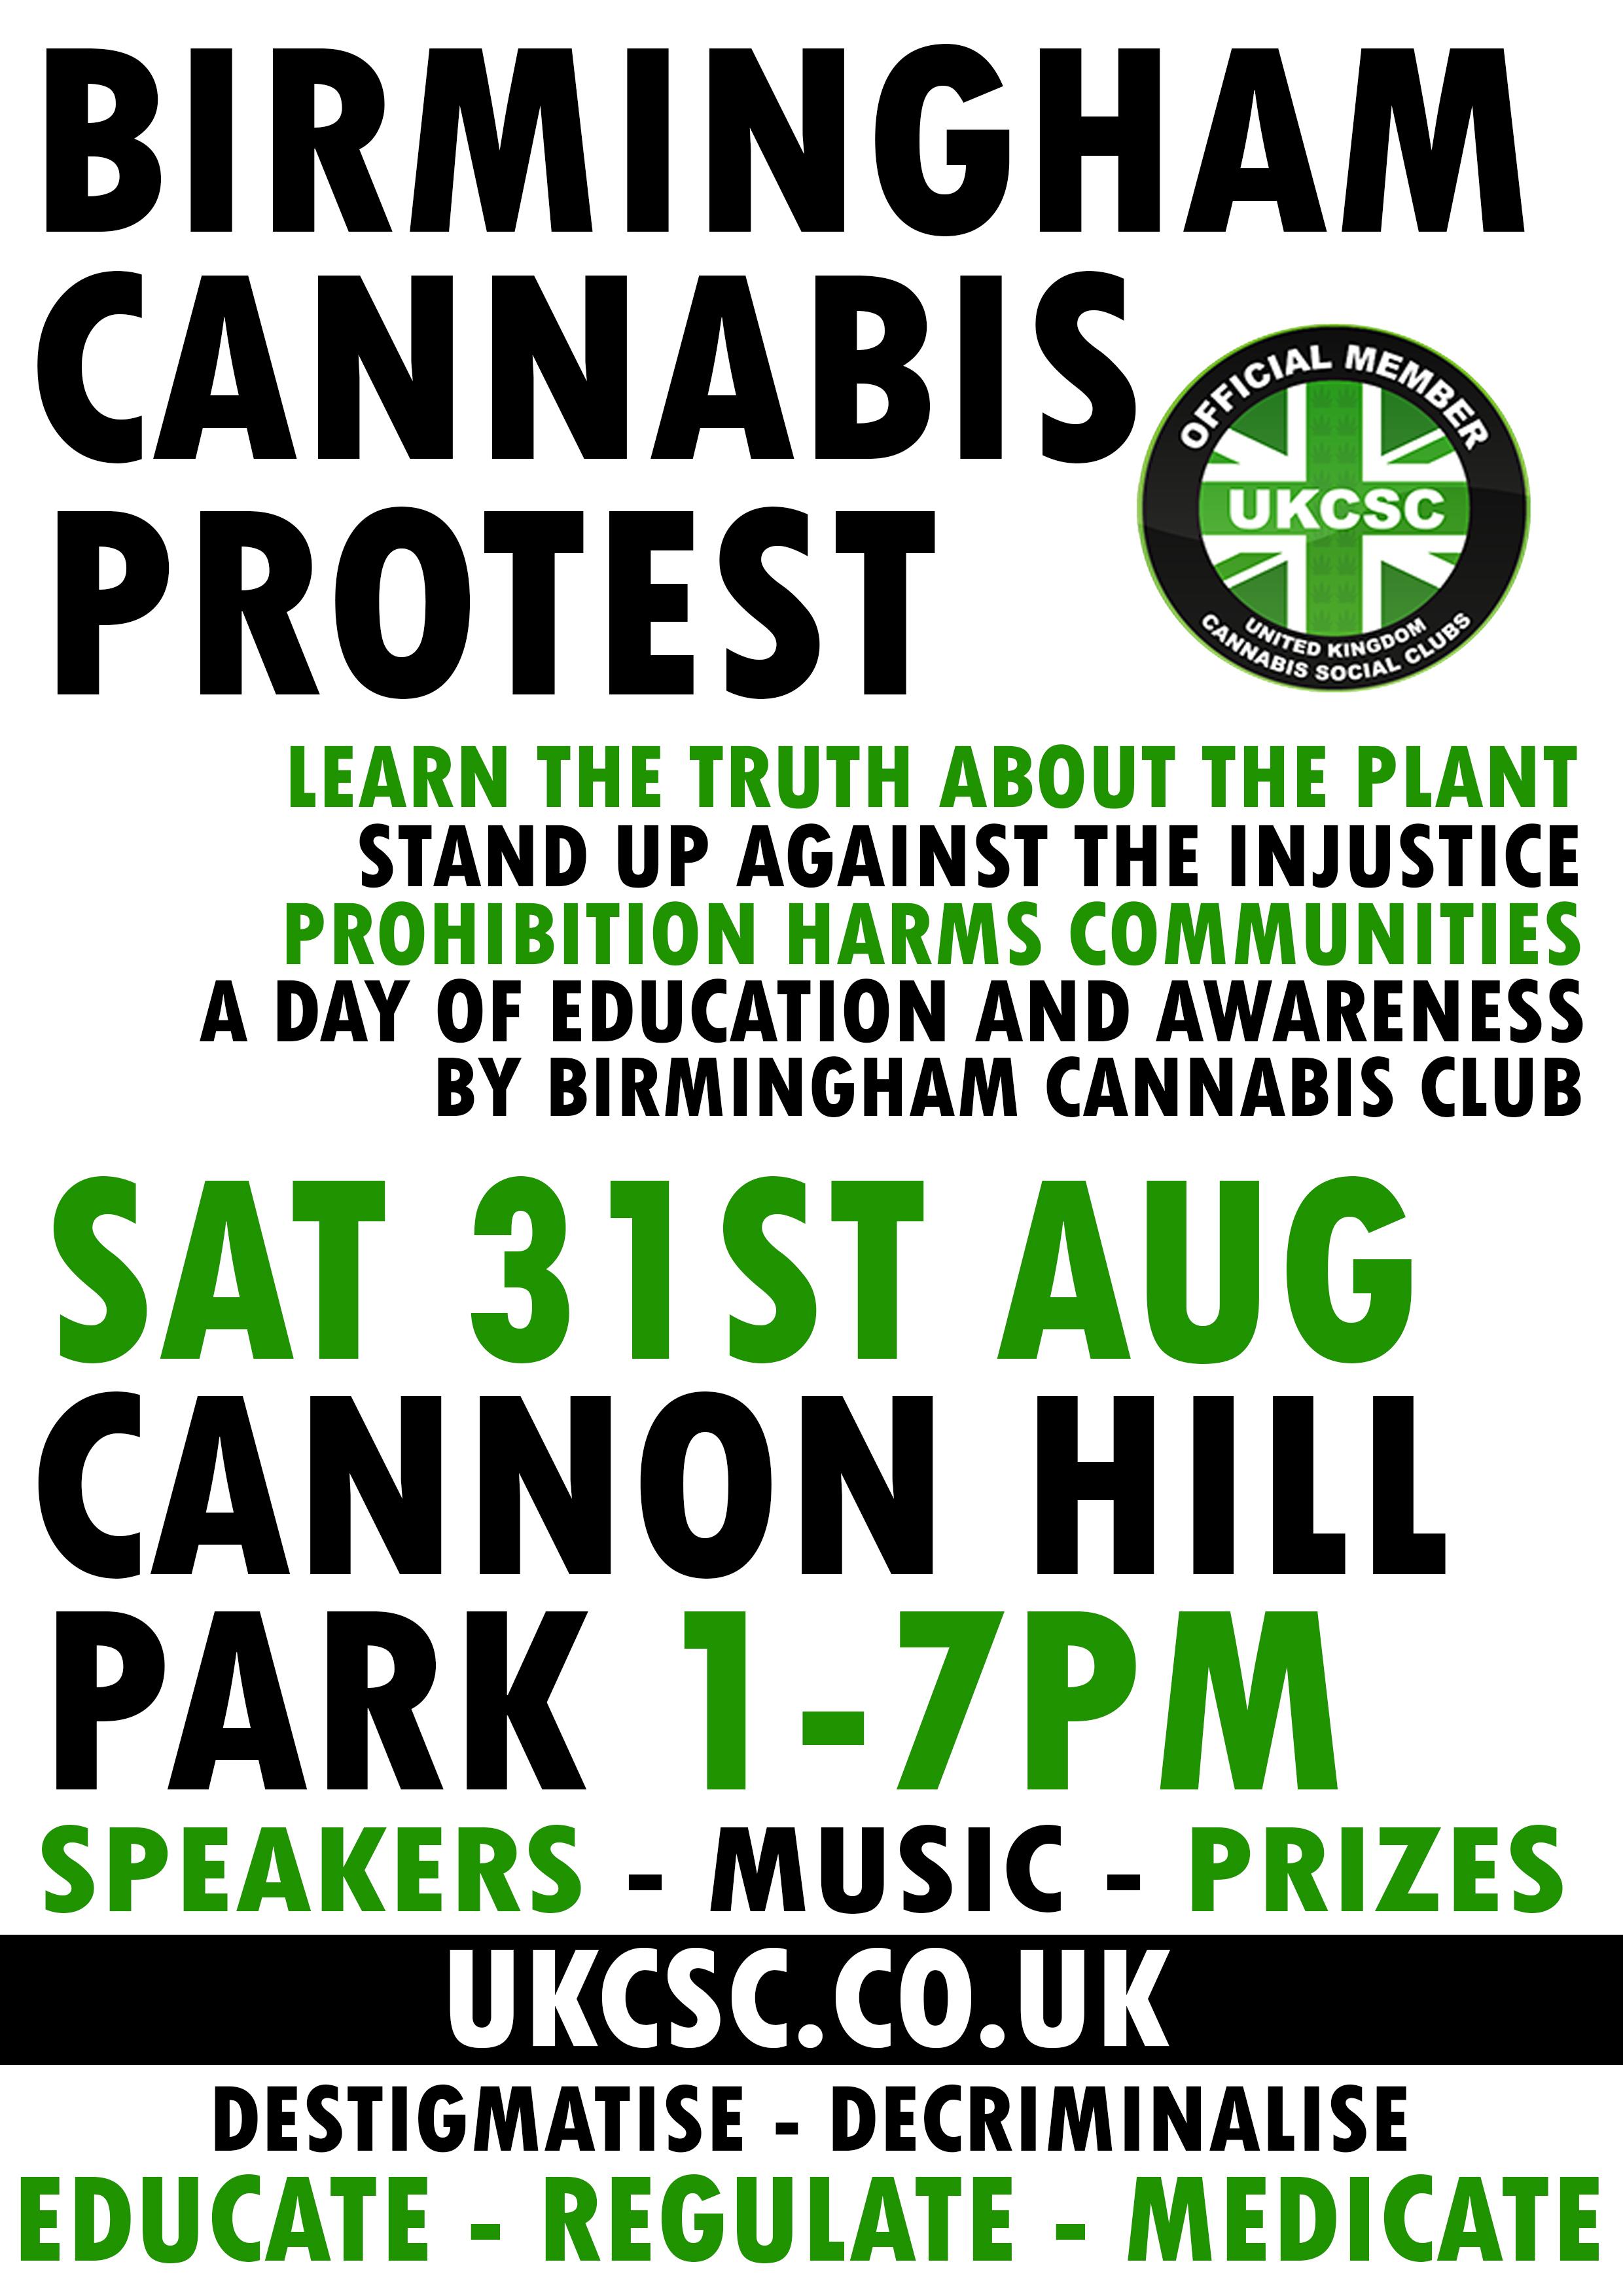 Birmingham Cannabis Protest